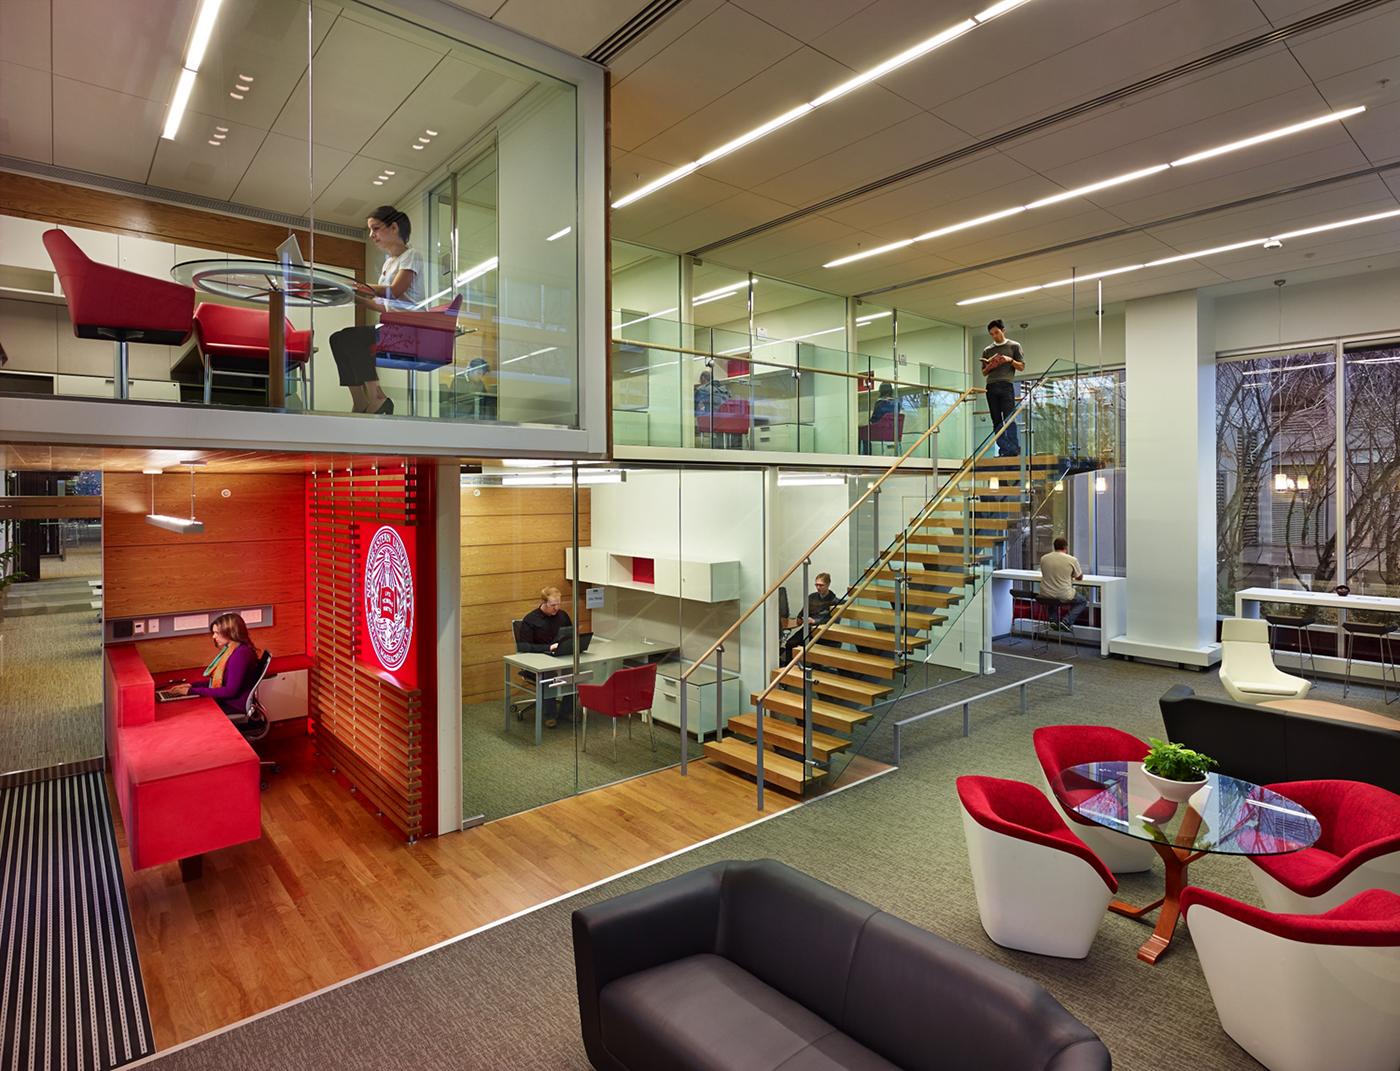 Gglo Architecture And Interior Design Llc